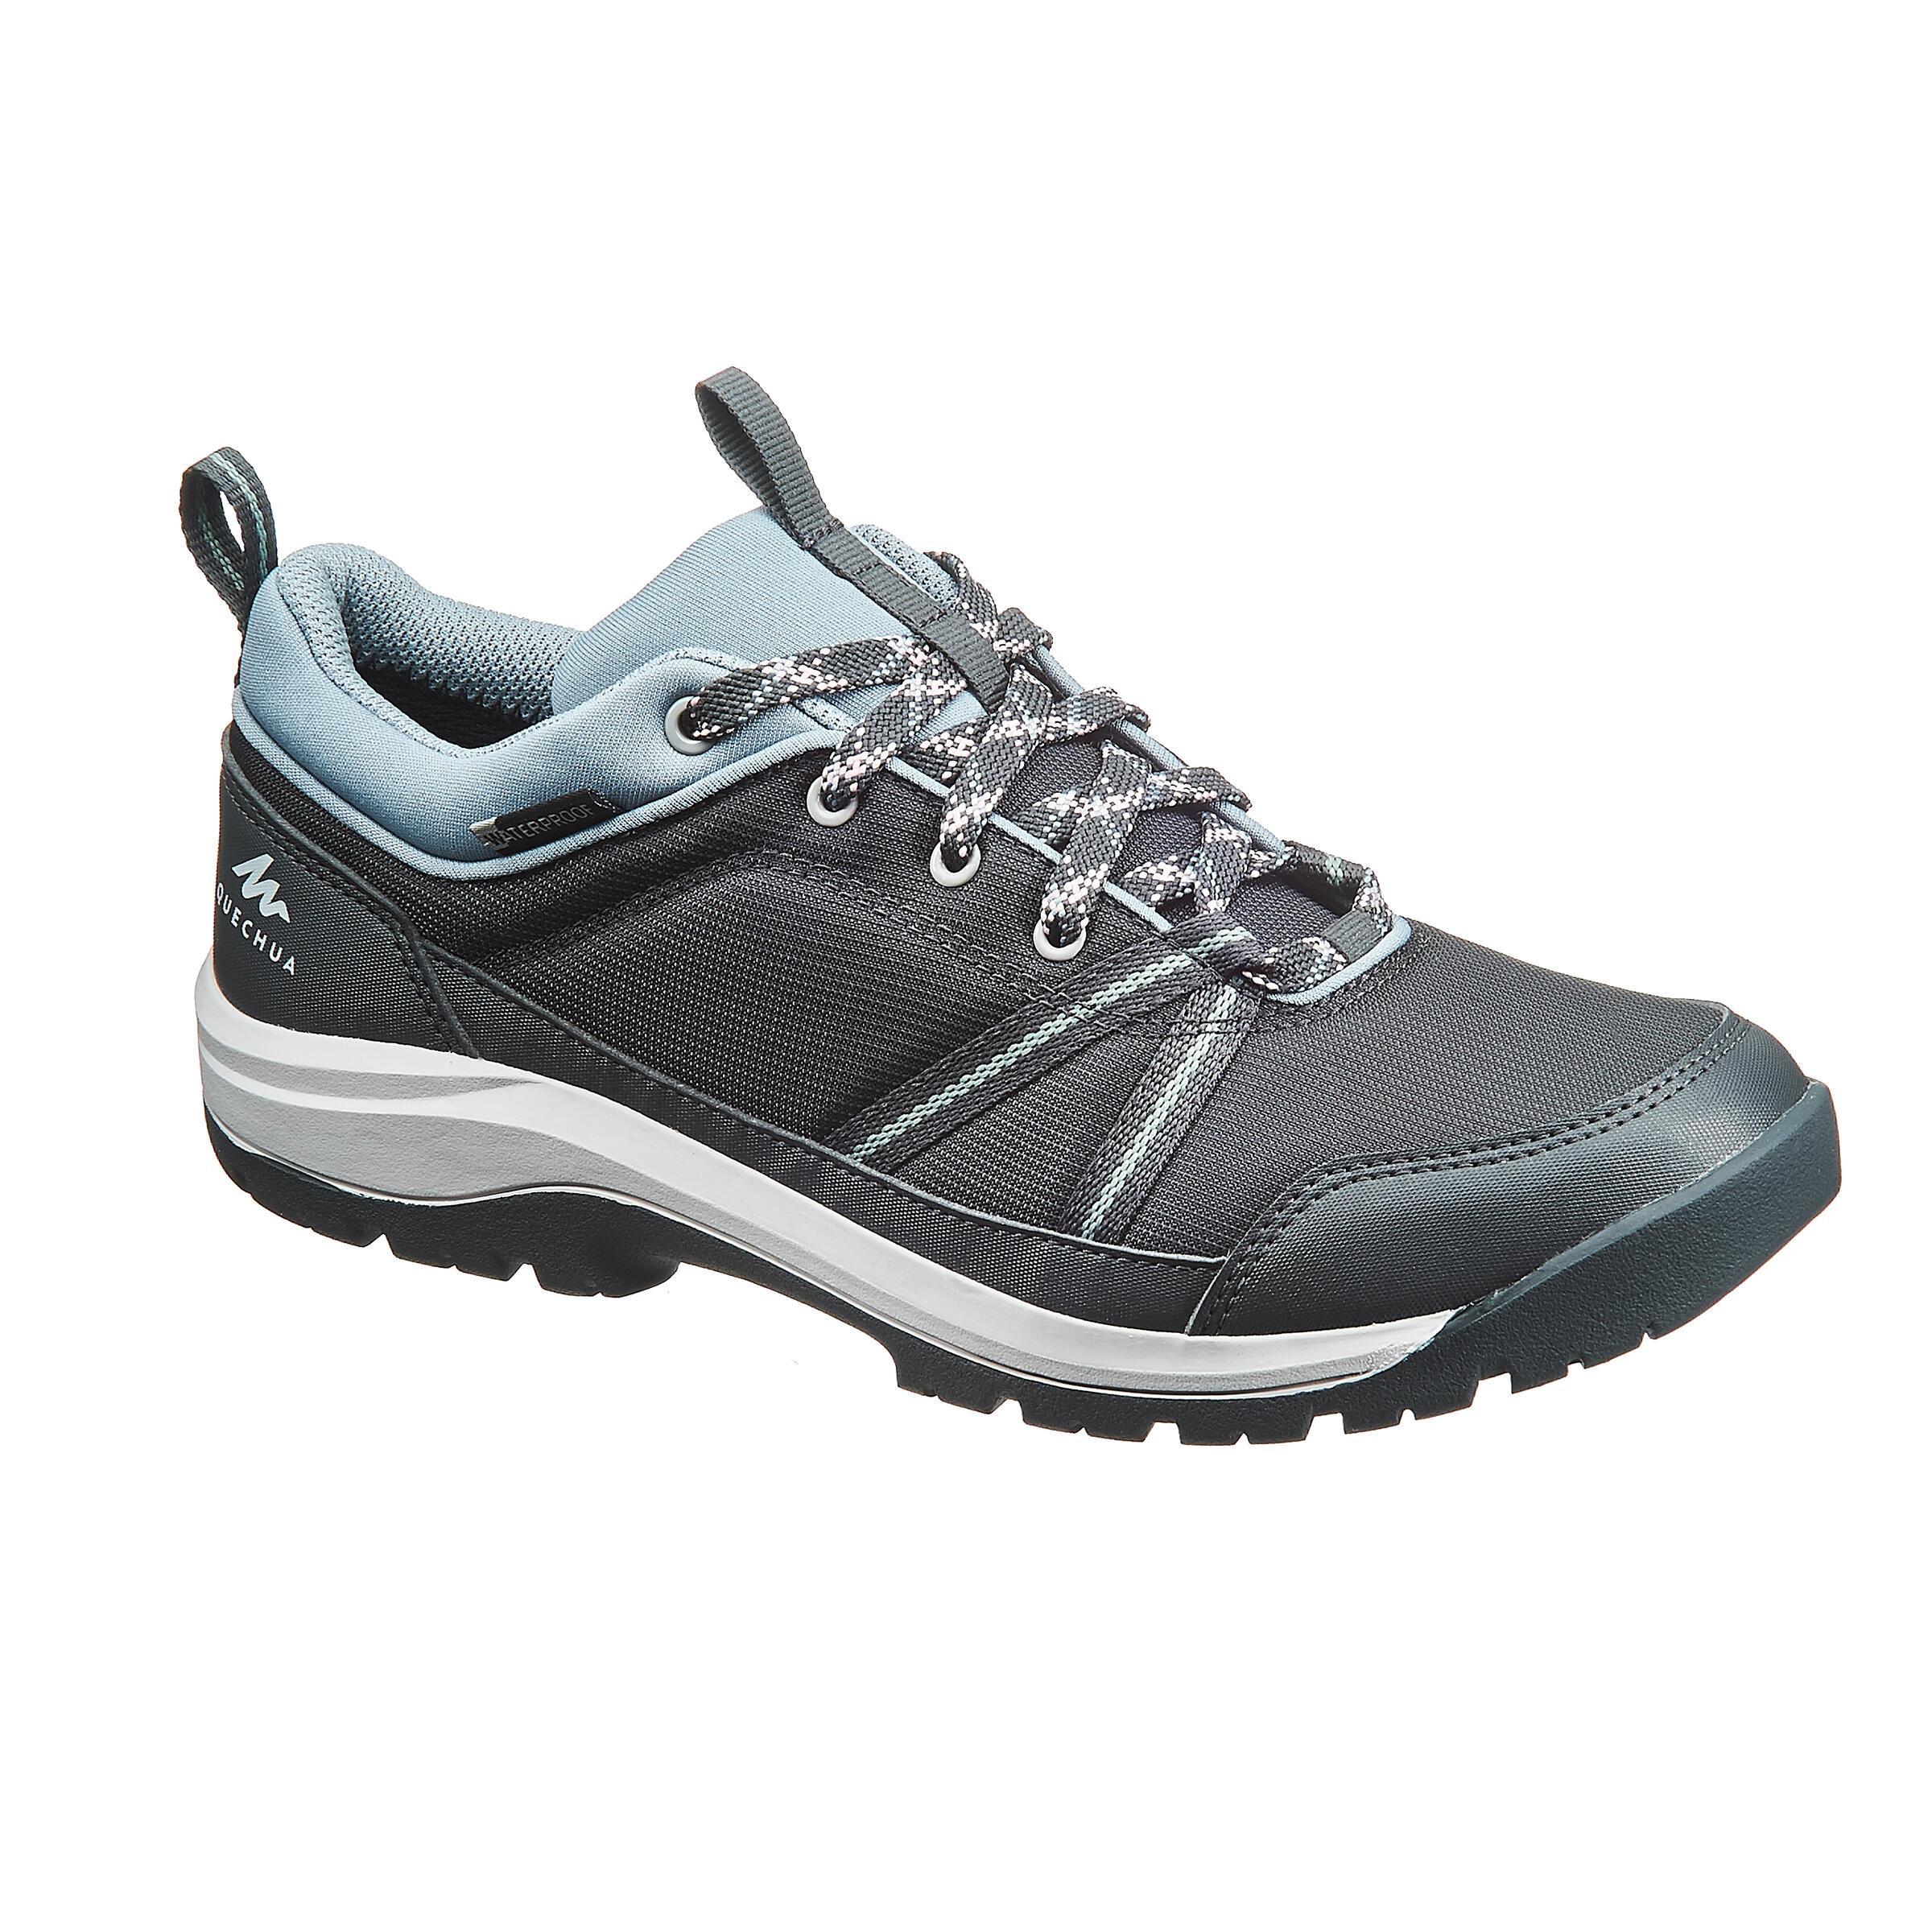 Wanderschuhe NH 150 Protect Damen grau für Naturwanderungen | Schuhe > Outdoorschuhe > Wanderschuhe | Grau | Gummi - Baumwolle | Quechua